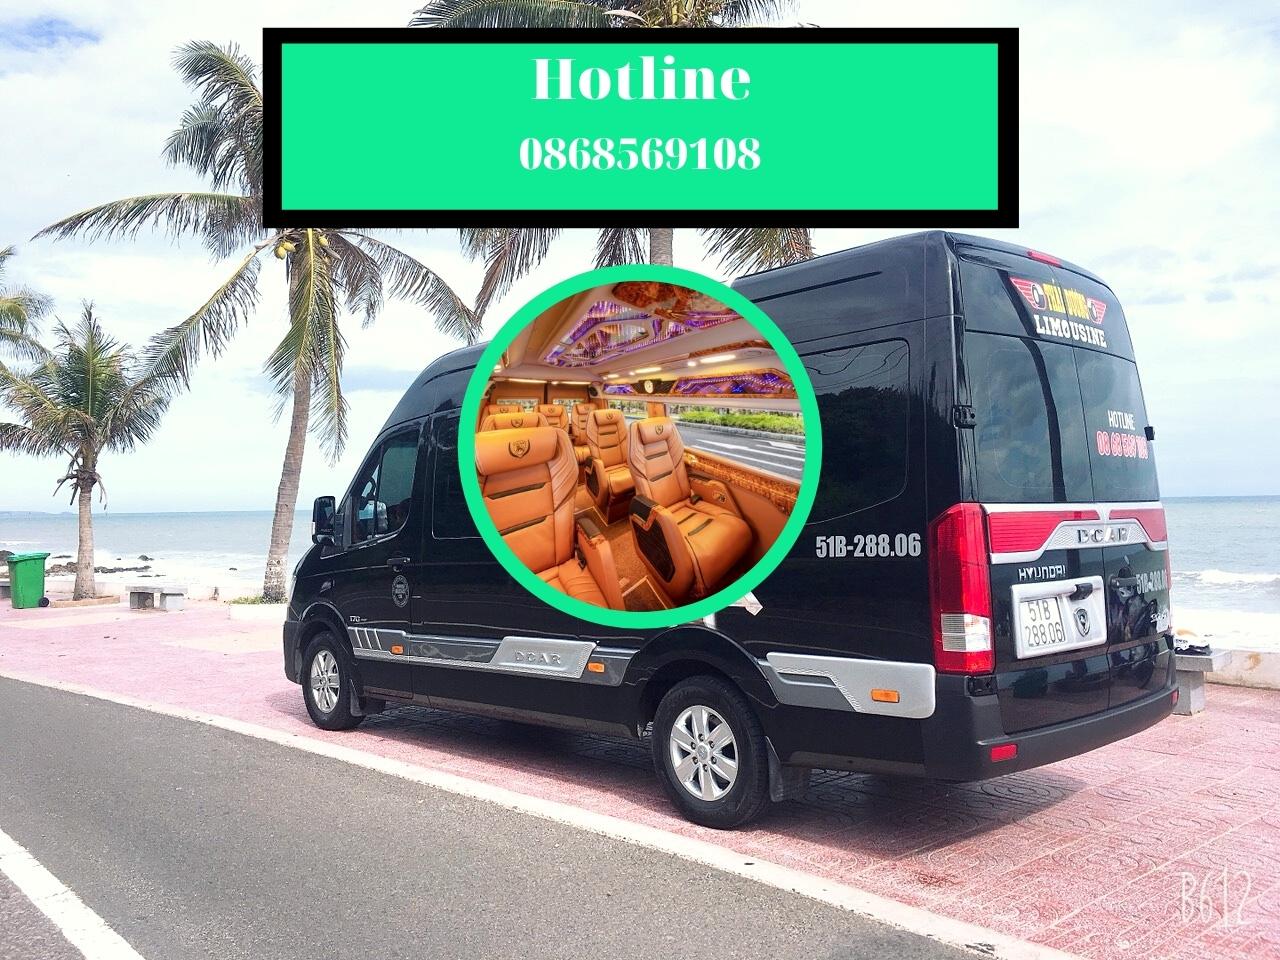 Thuê xe LimousineThái Dương đi Cần Thơ